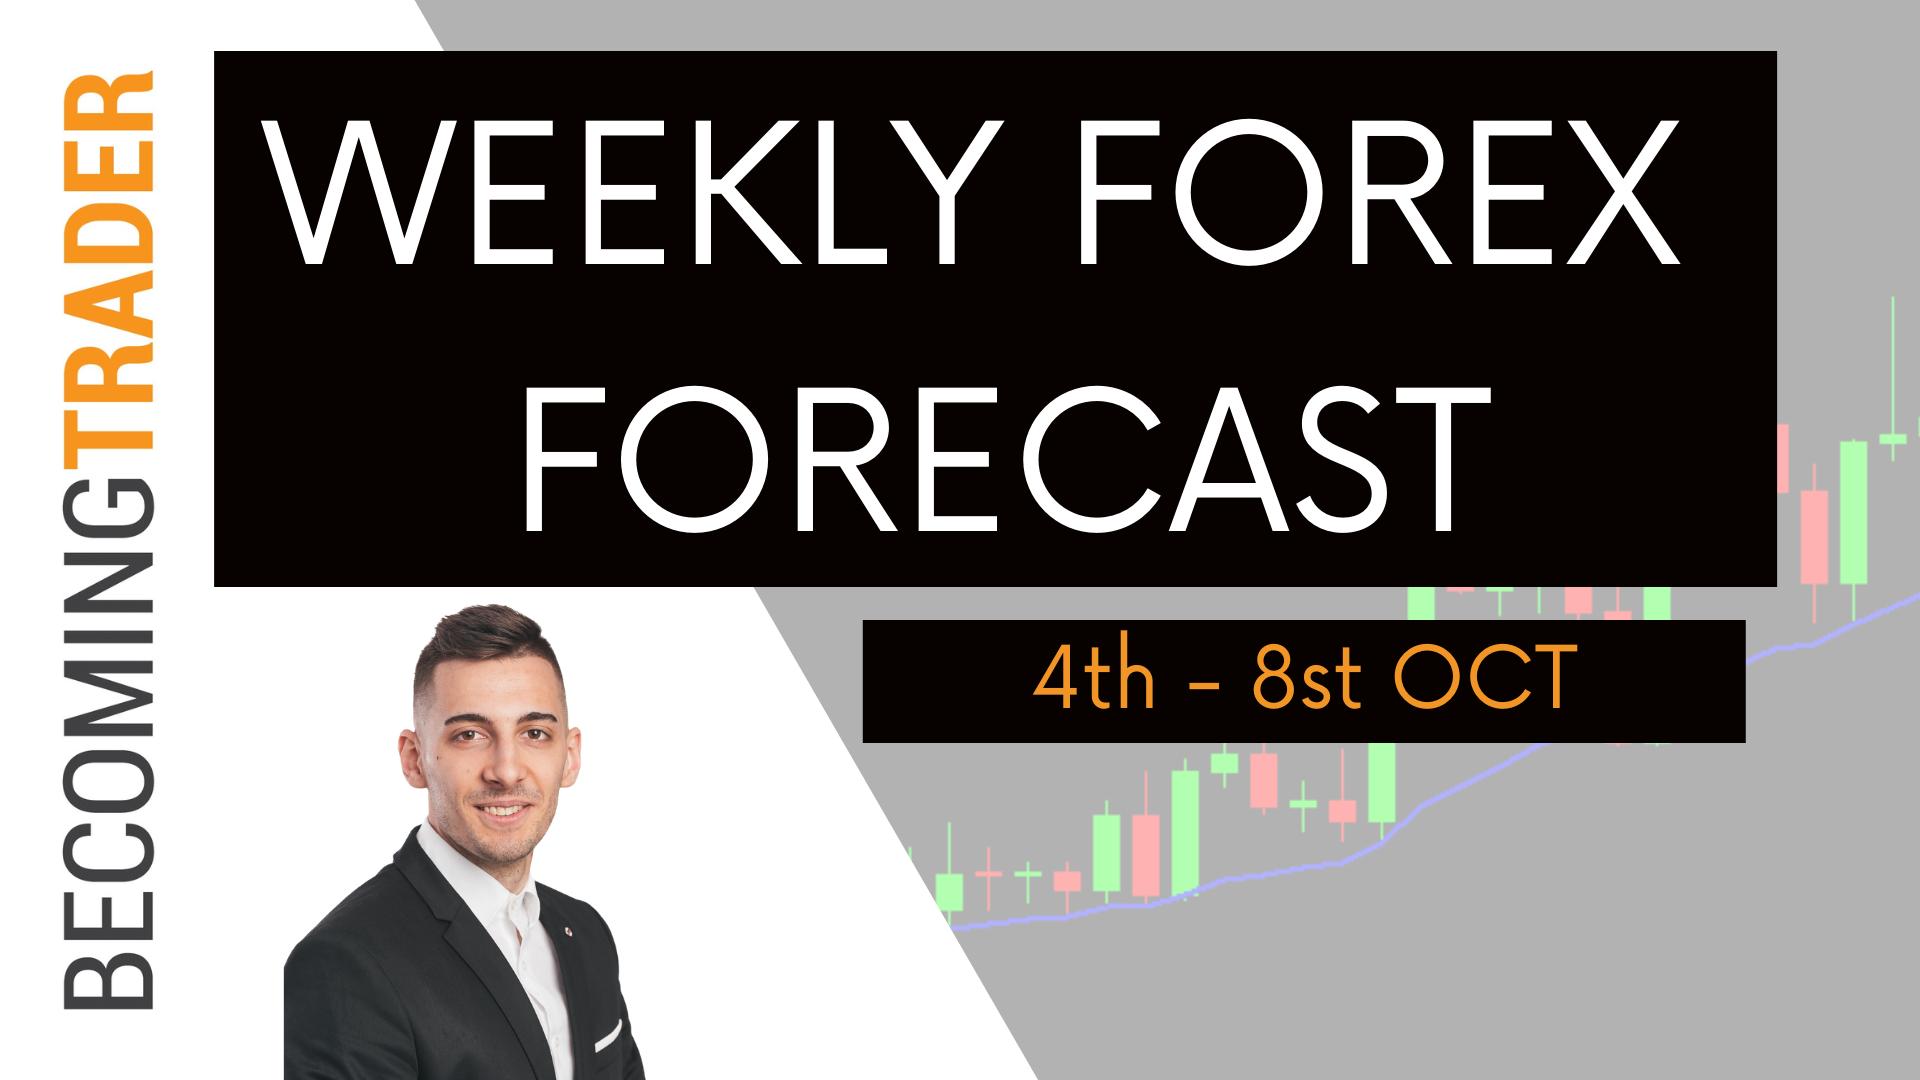 Weekly Forex Forecast 4th to 8th October 2021 | EURUSD , GBPUSD , AUDUSD , NZDUSD , USDCAD , USDJPY